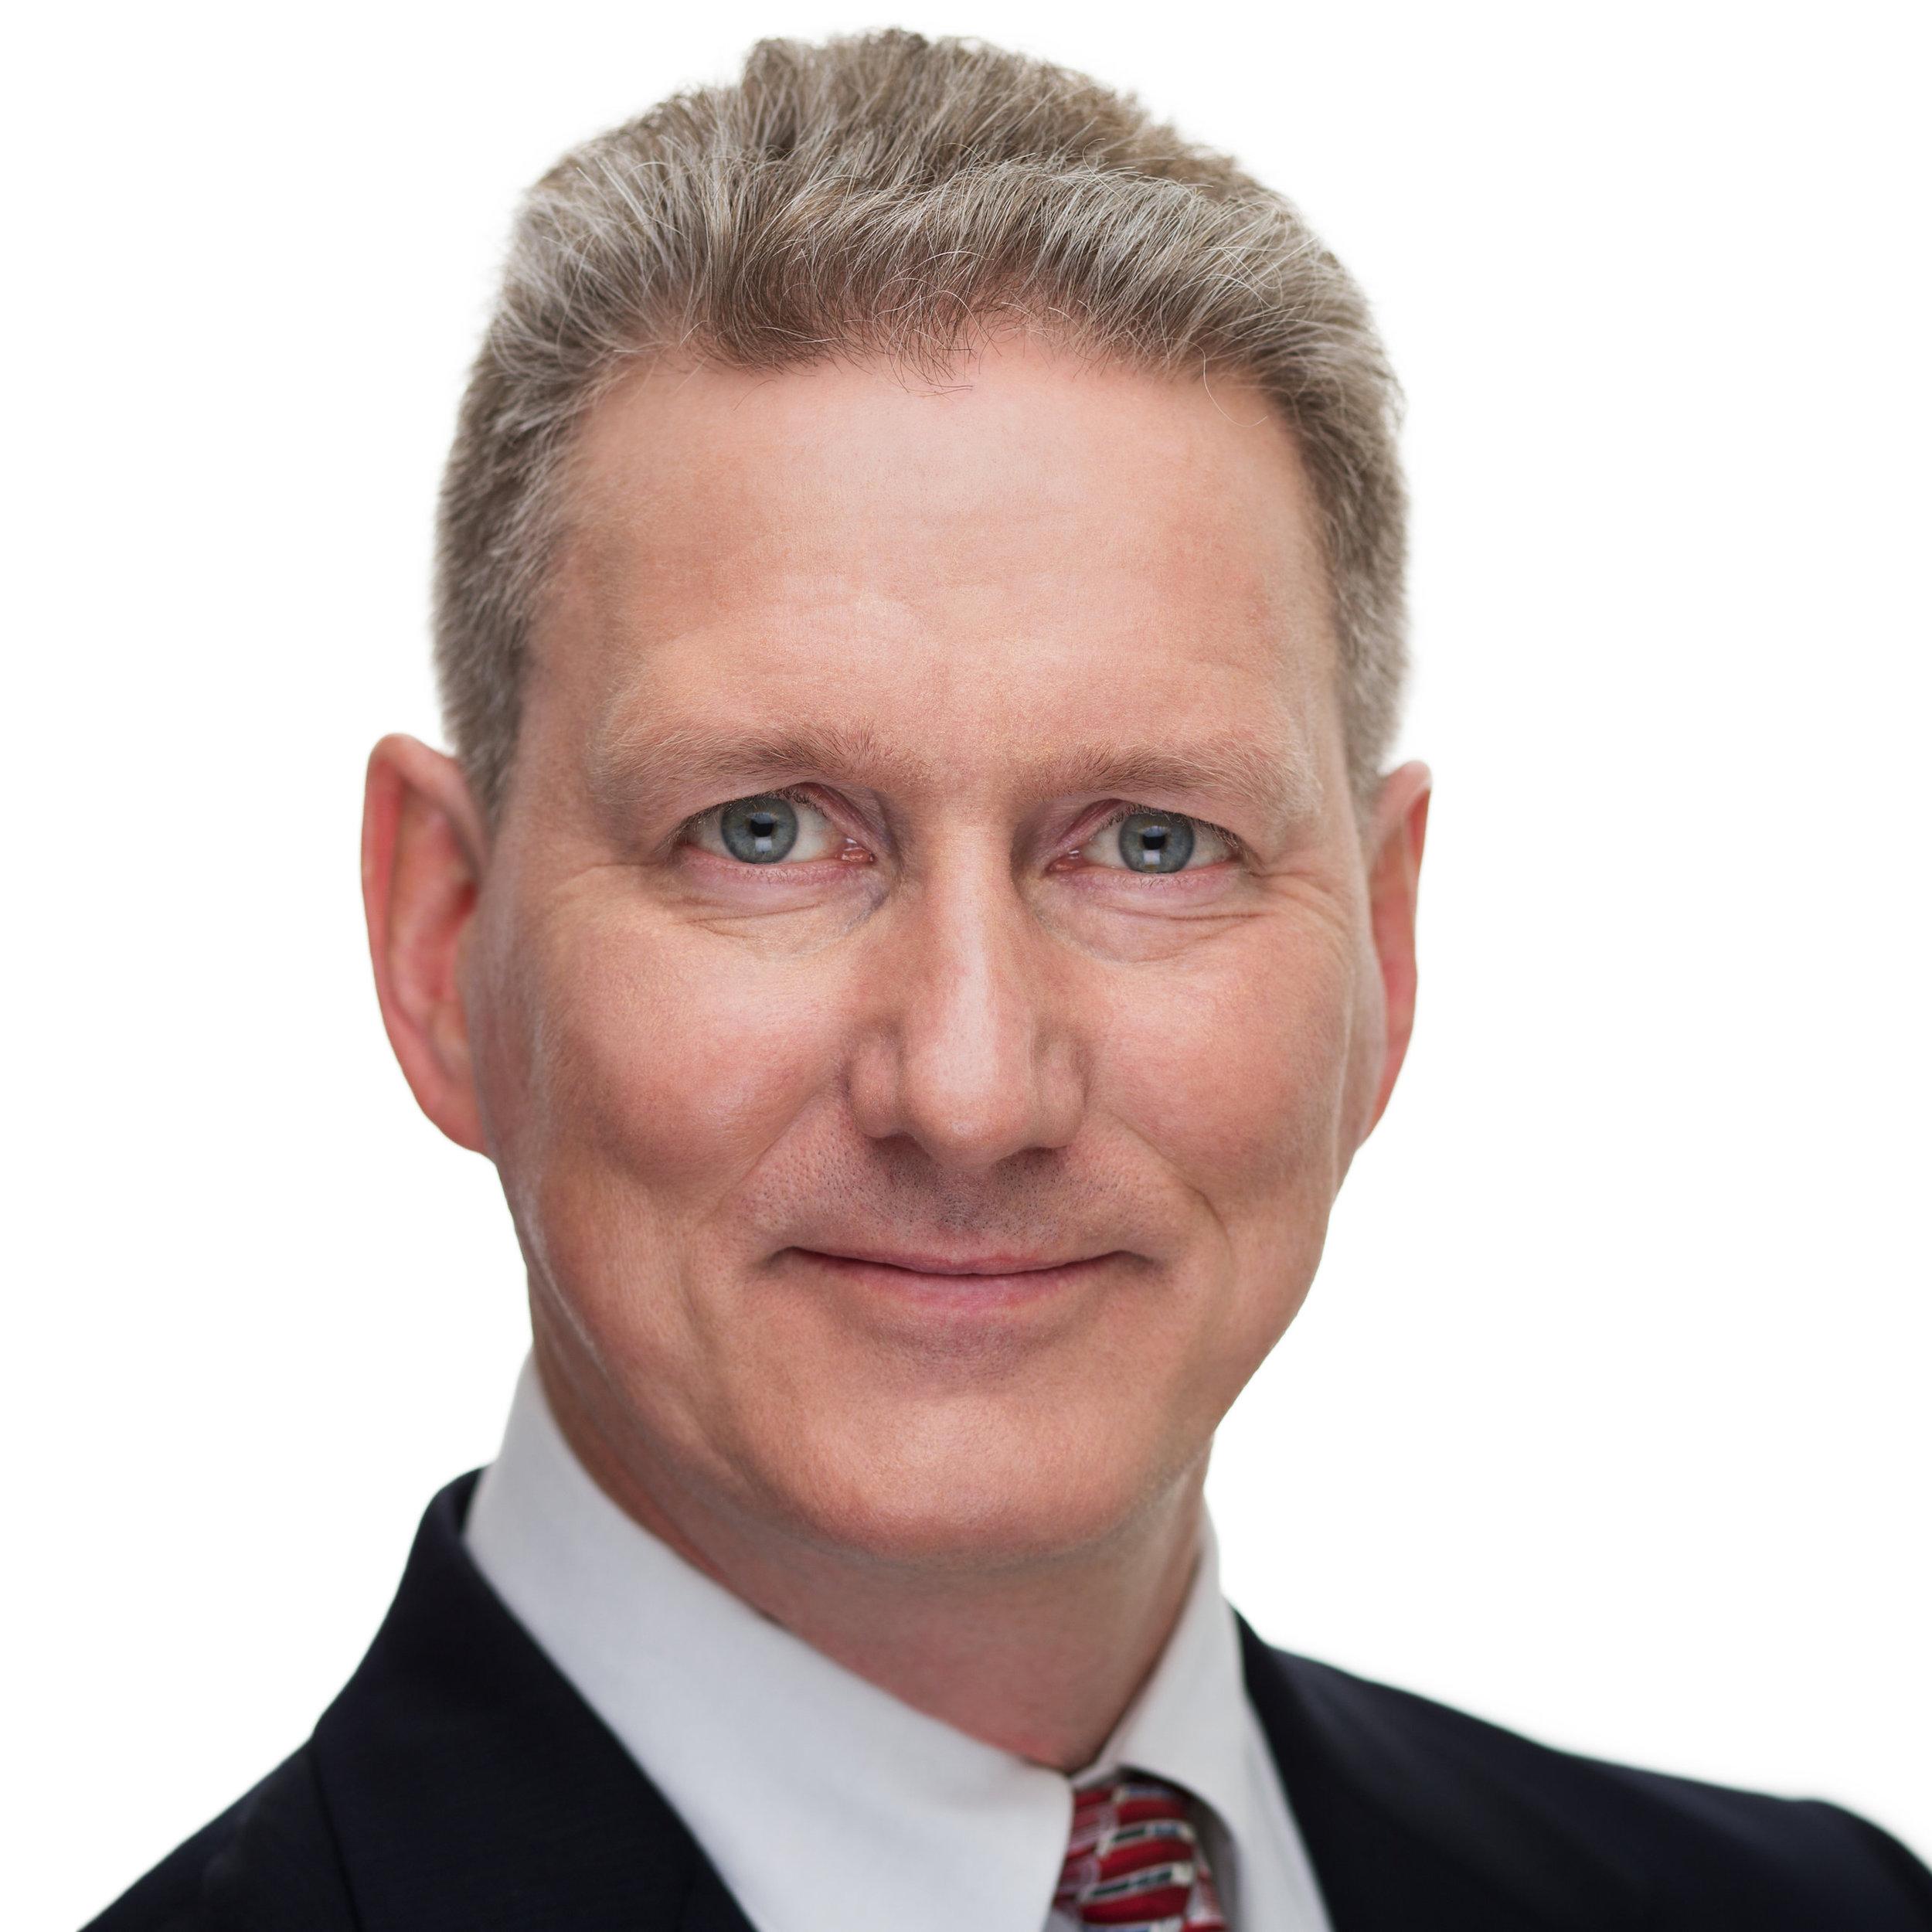 Tim Swanson